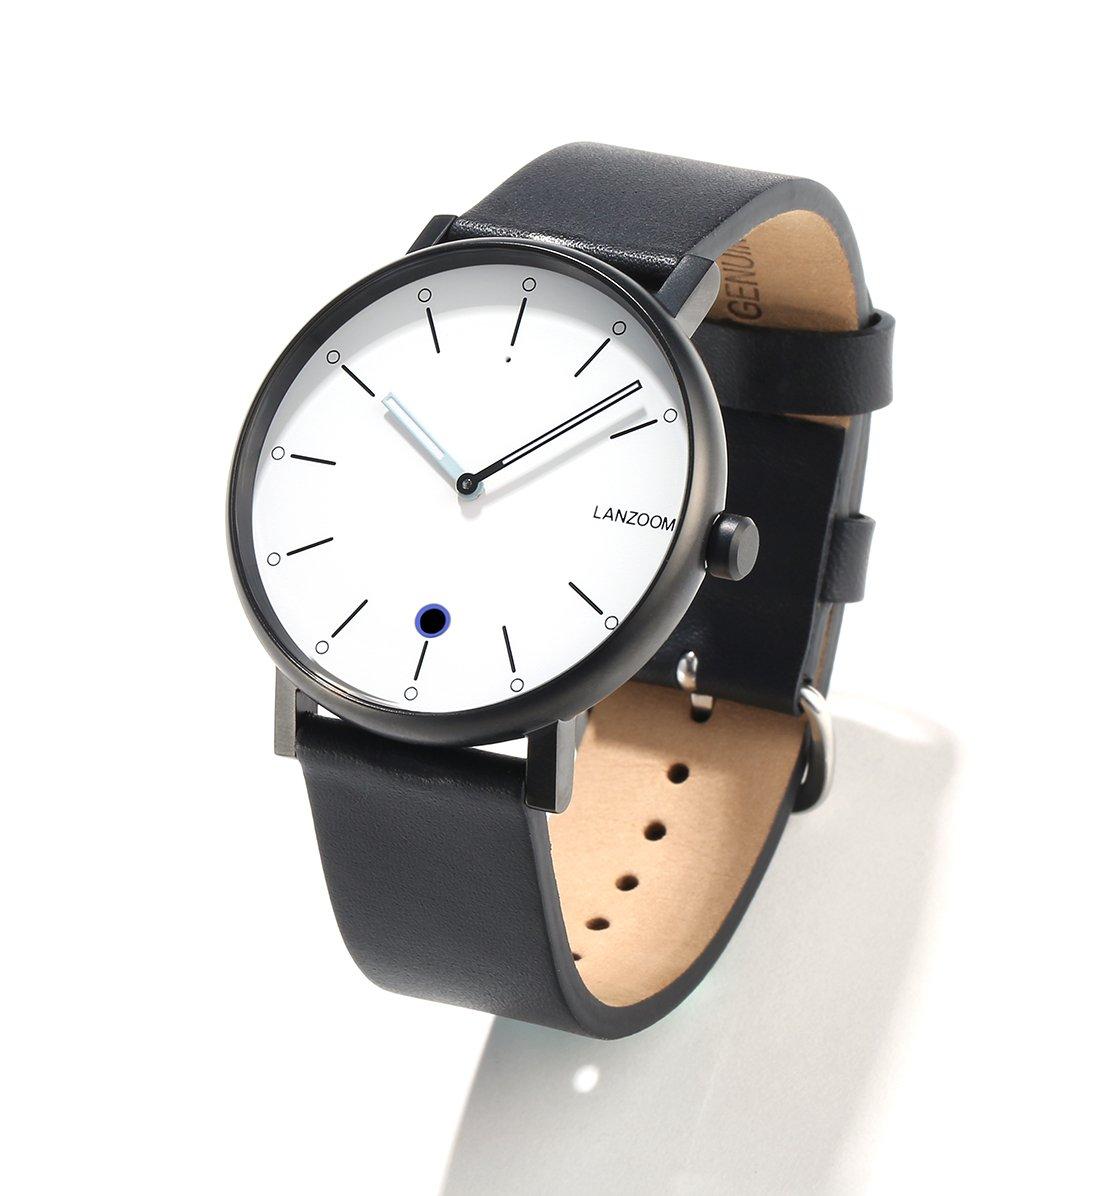 LANZOOM Rhine41-12-1L Business Classic Luxury Sport Quartz Bluetooth Smart Wrist Watch Light Hybrid Sports Fitness Multifunctional Smartwatches For Men Women (White + Black)